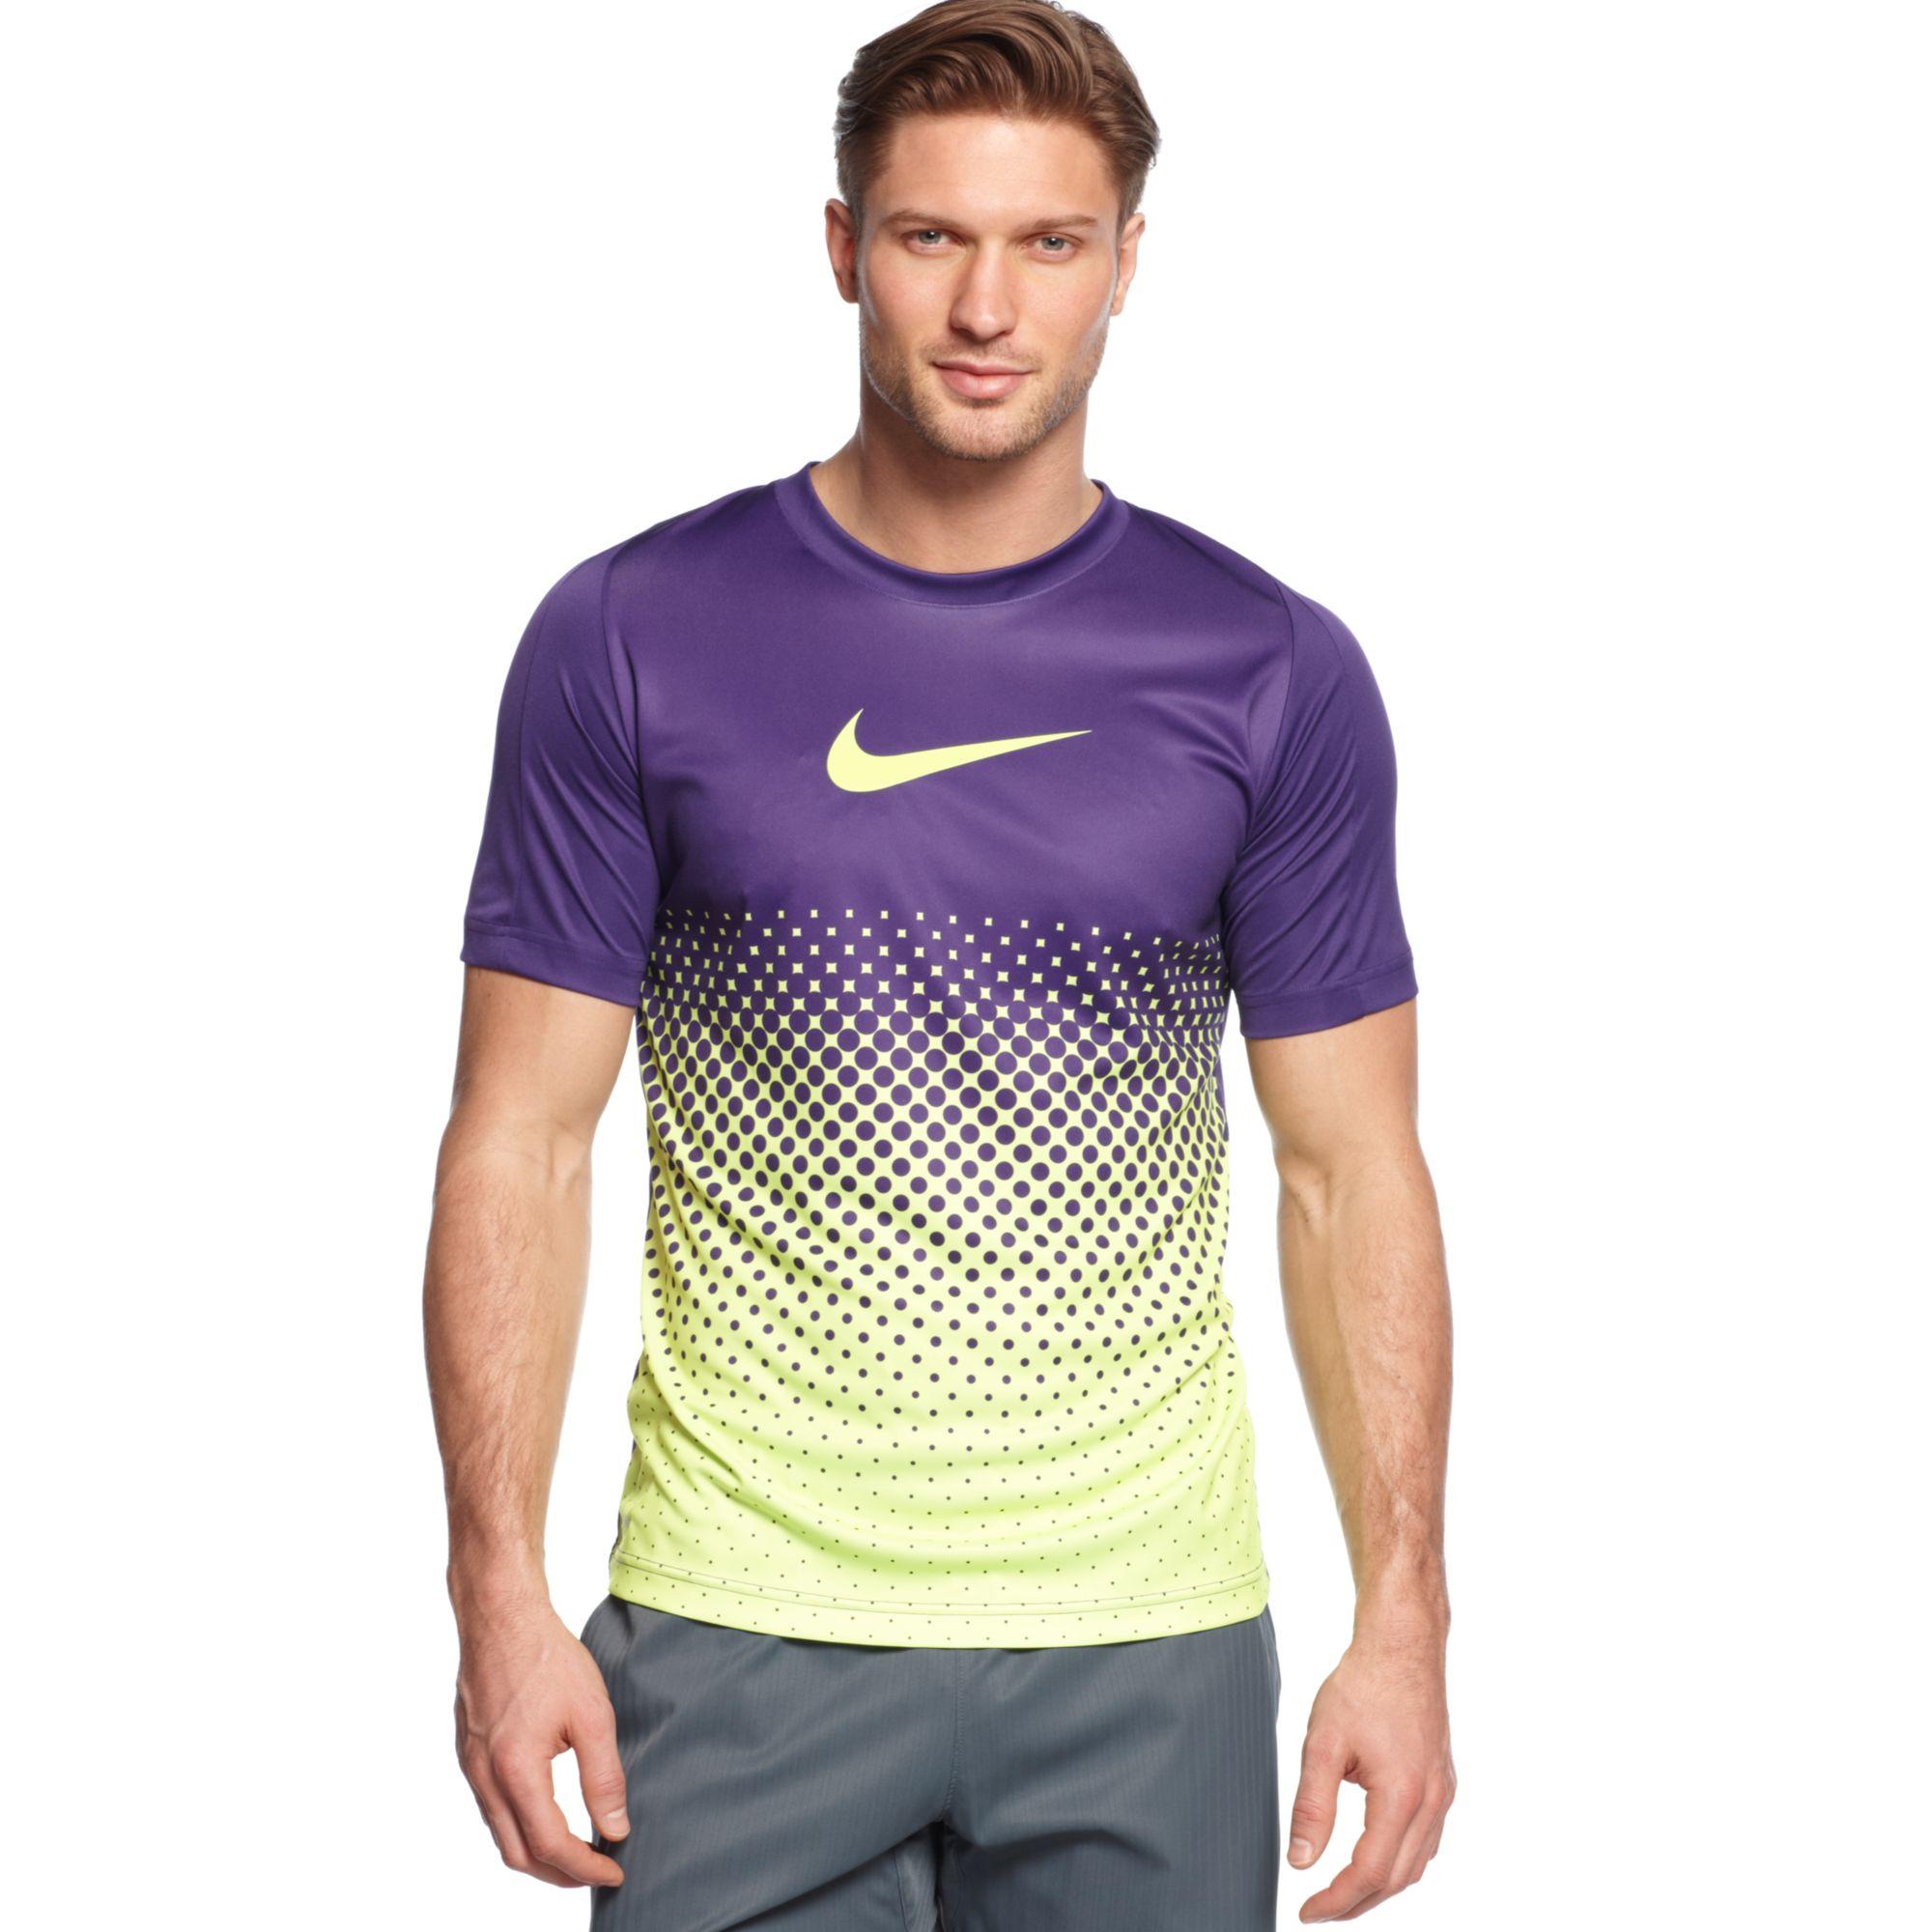 85da3923 Nike Mens Dri Fit Gpx Gradient T Shirt – EDGE Engineering and ...